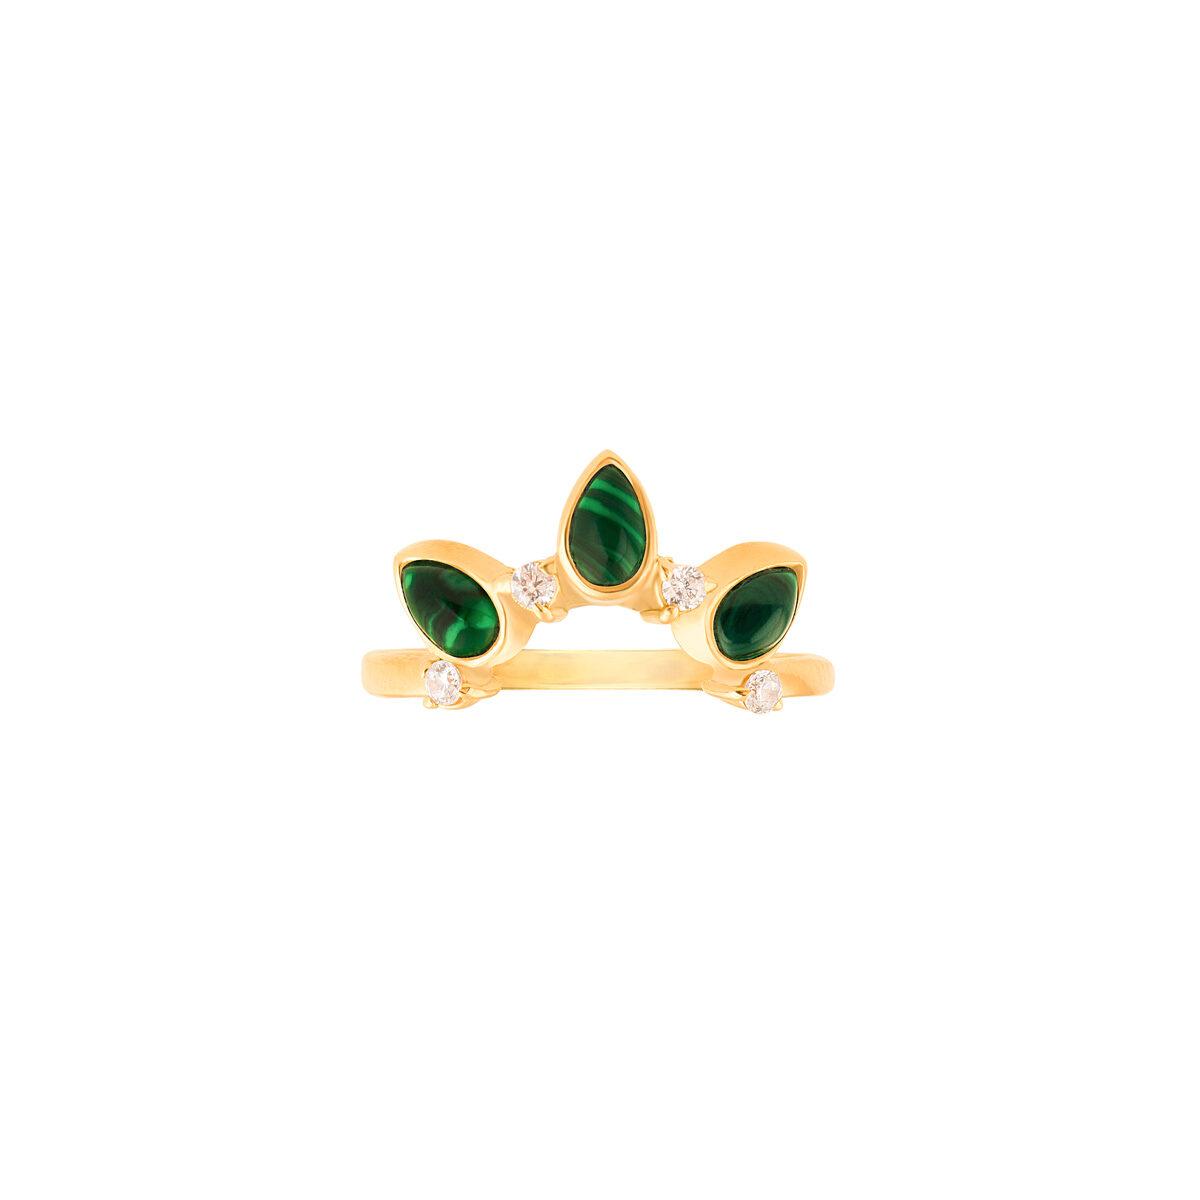 انگشتر طلا تک رینگ مینِلاوا سبز